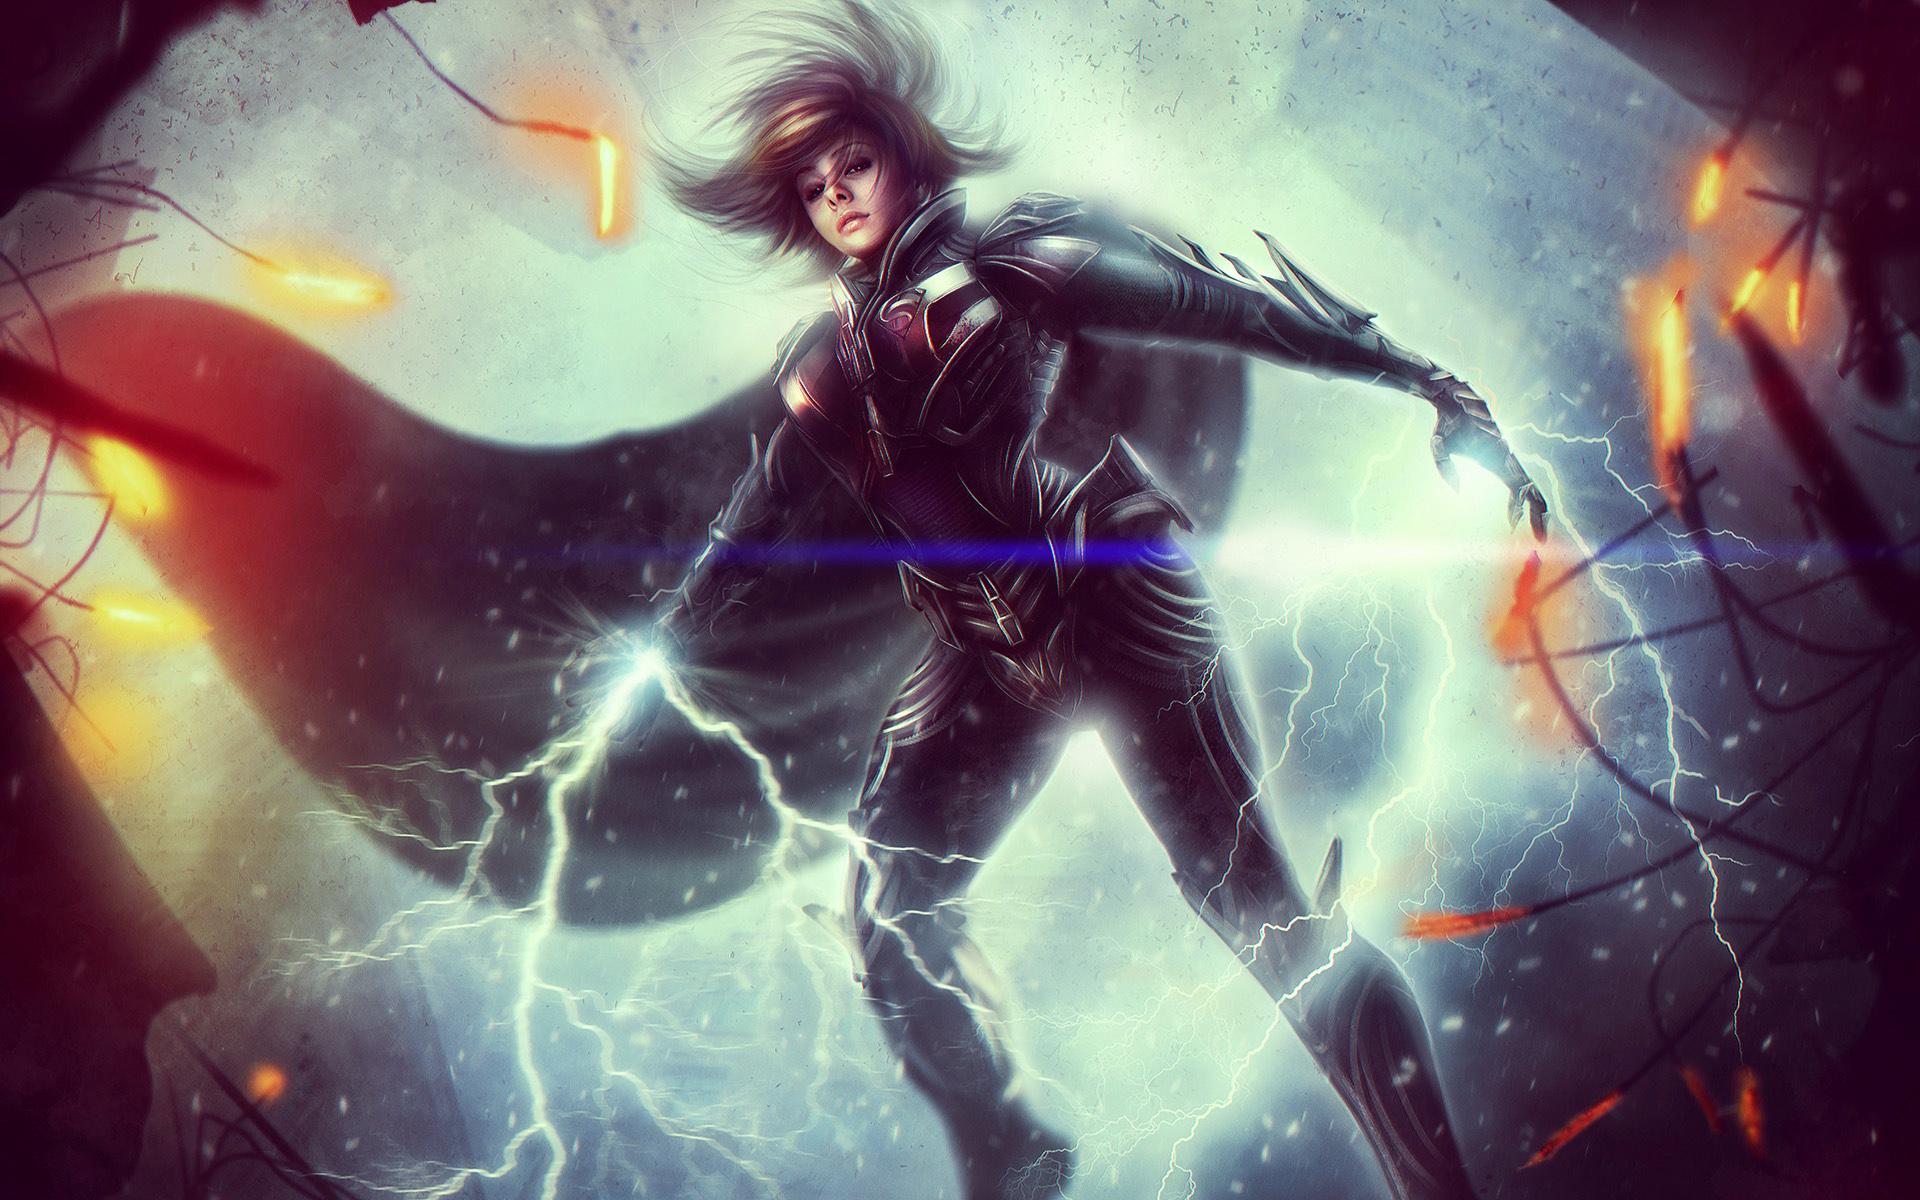 HD Wallpapers Kyla DC Universe Online